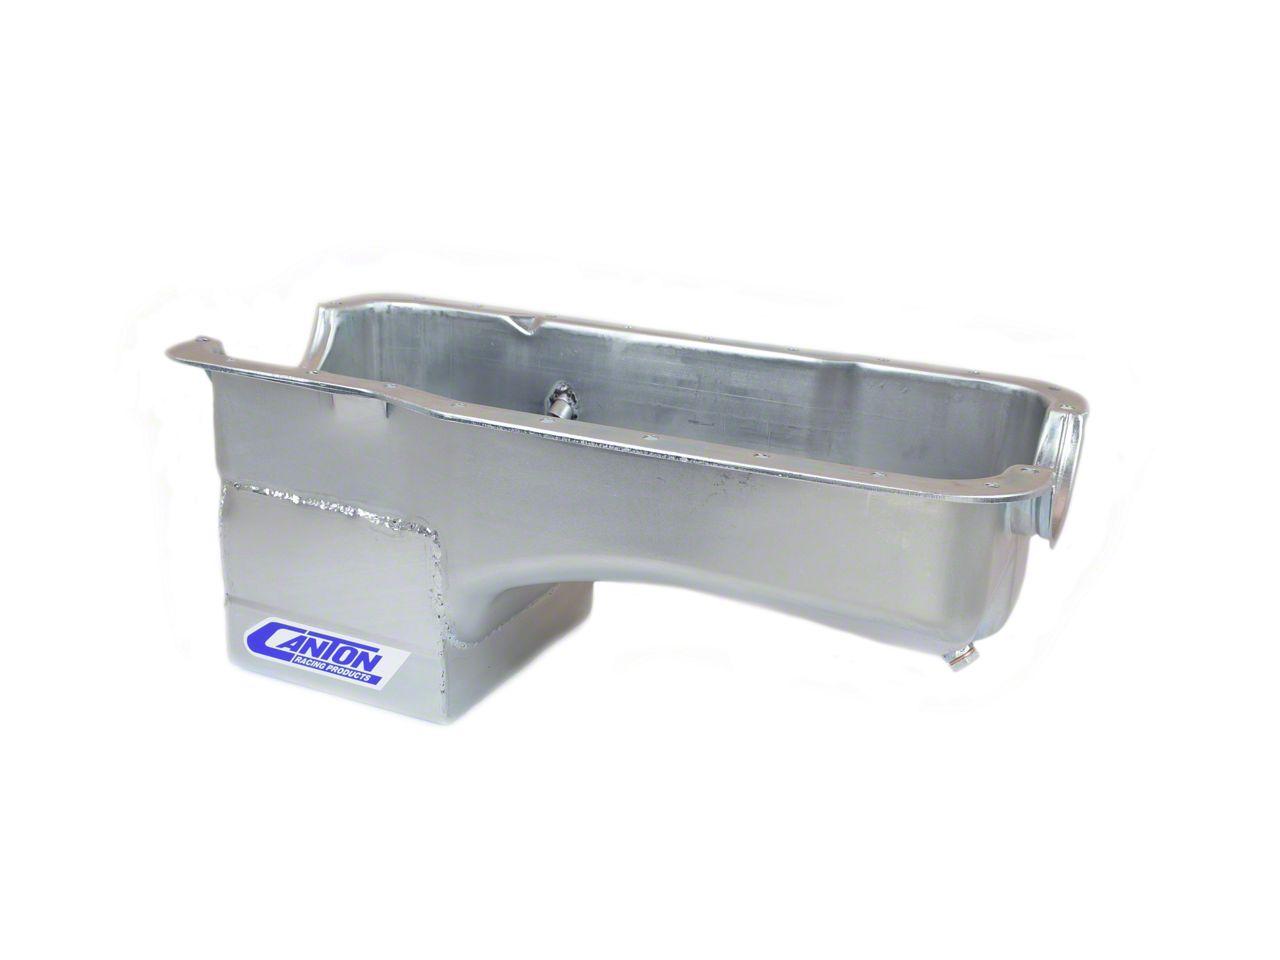 Canton Deep Rear Sump Oil Pan for use w/ Main Support Girdle - Street (79-93 5.0L)